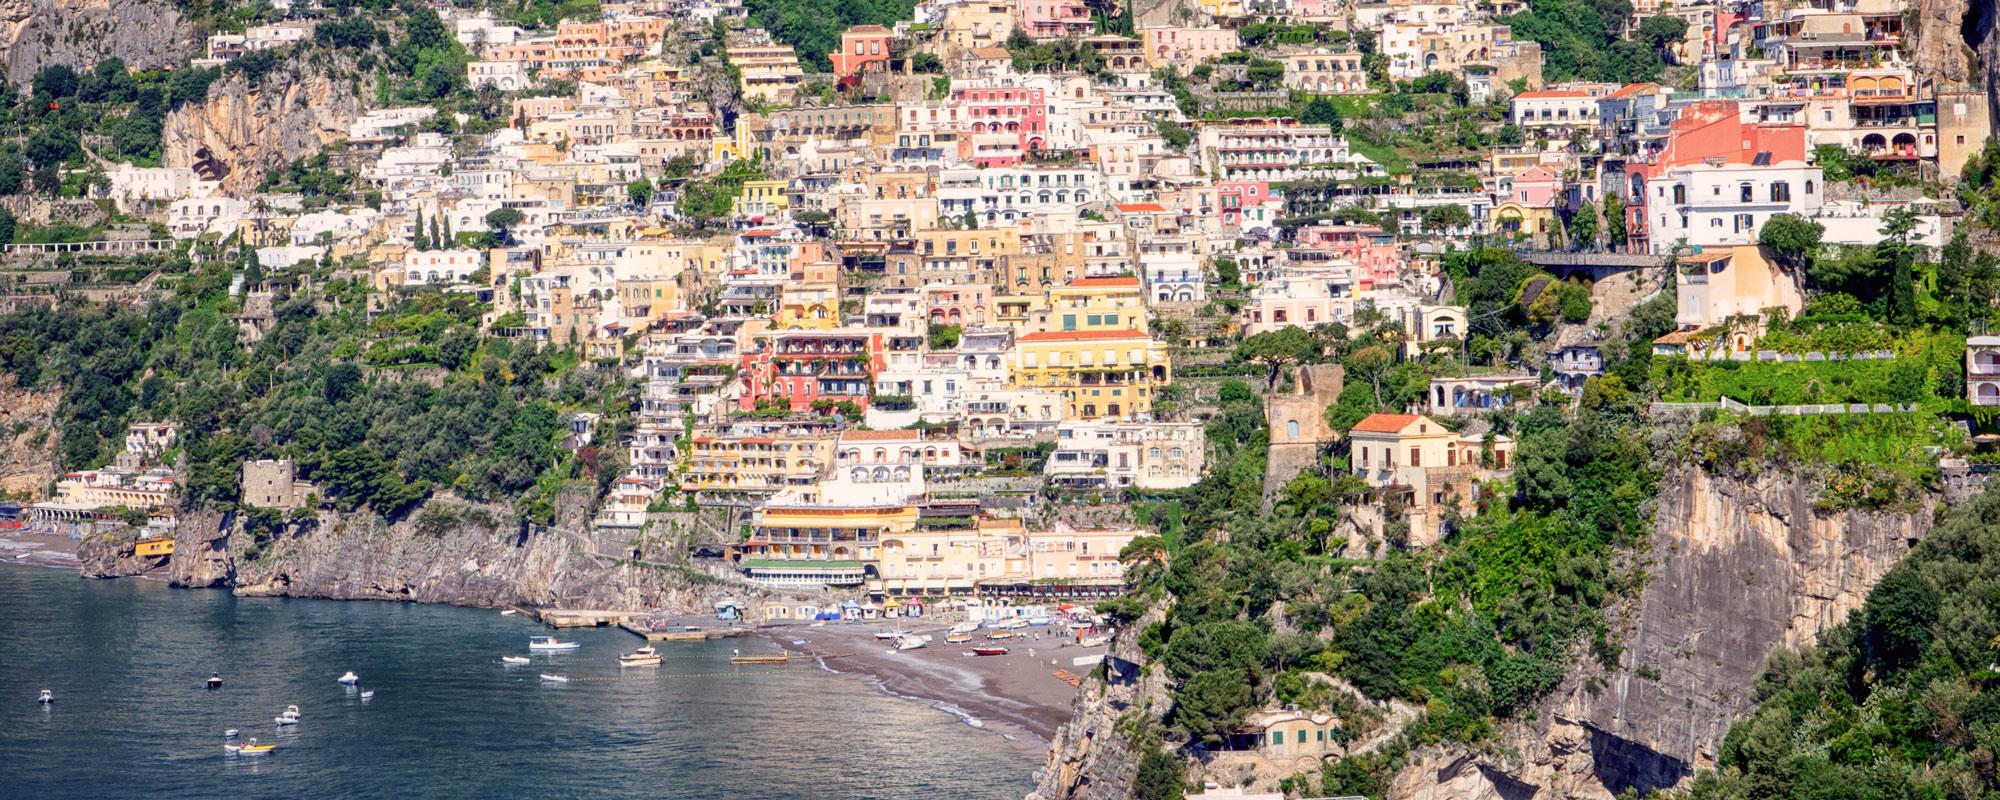 Campania Positano